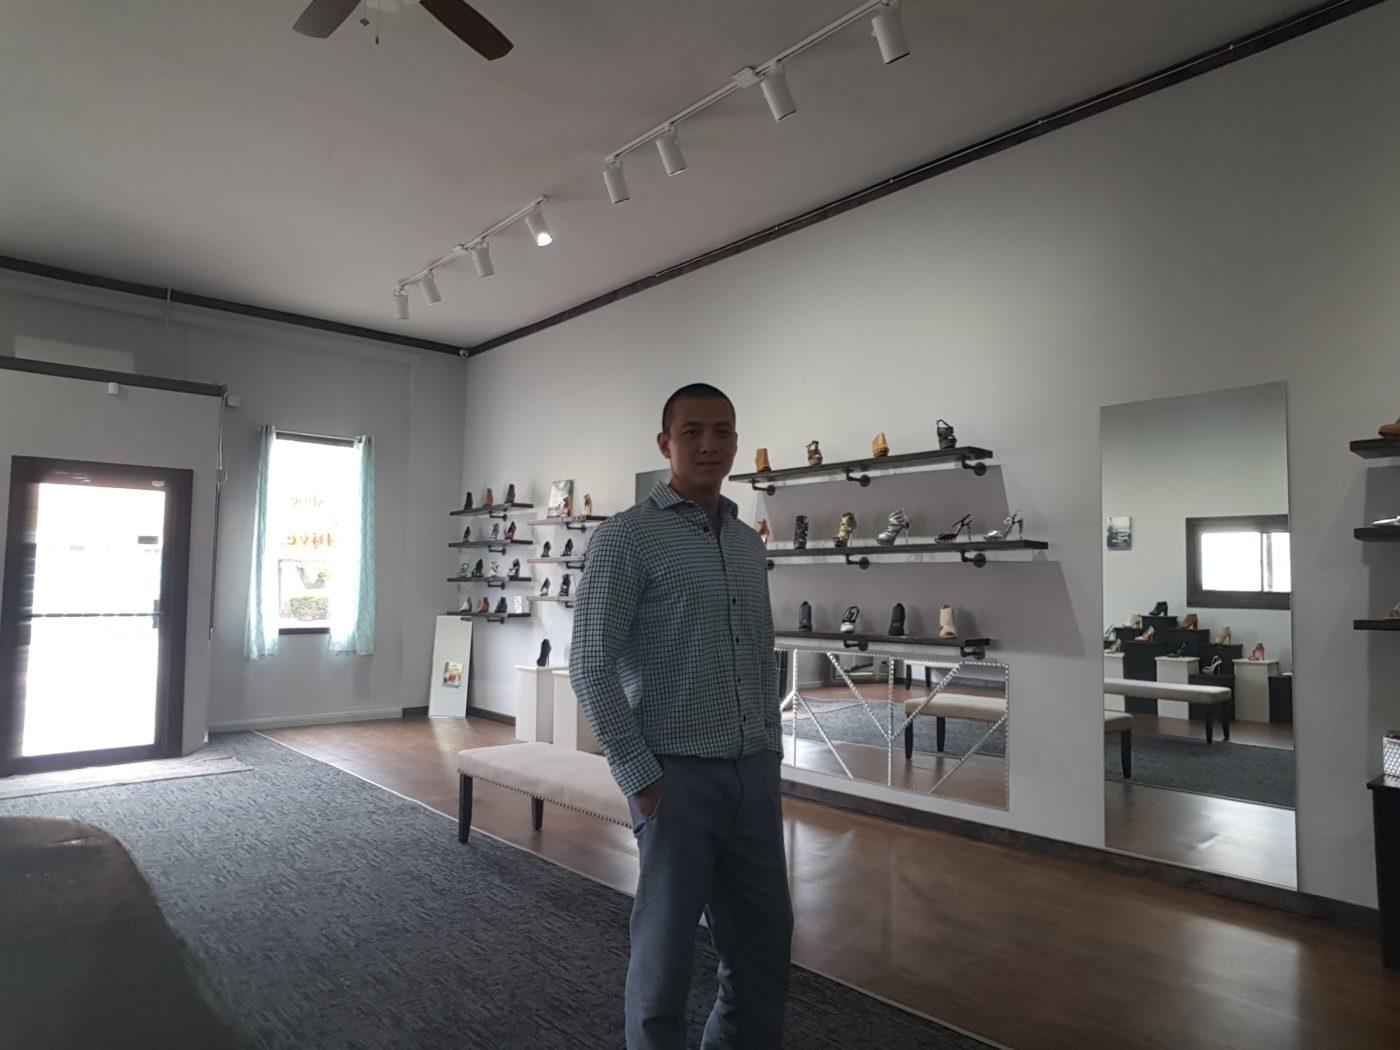 image inside shoe store